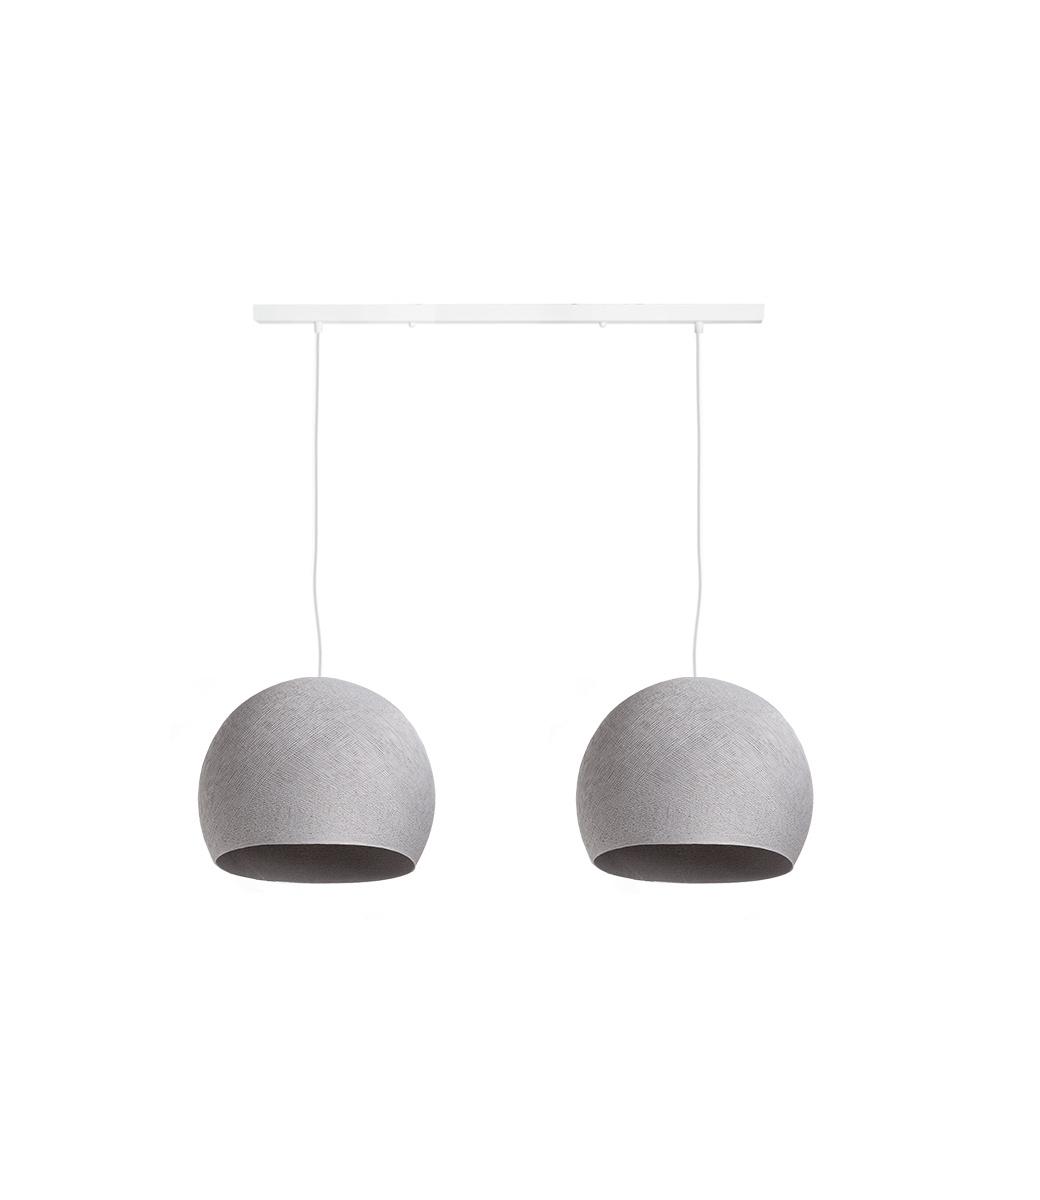 Cotton Ball Lights Tweevoudige hanglamp balk - Driekwart Stone